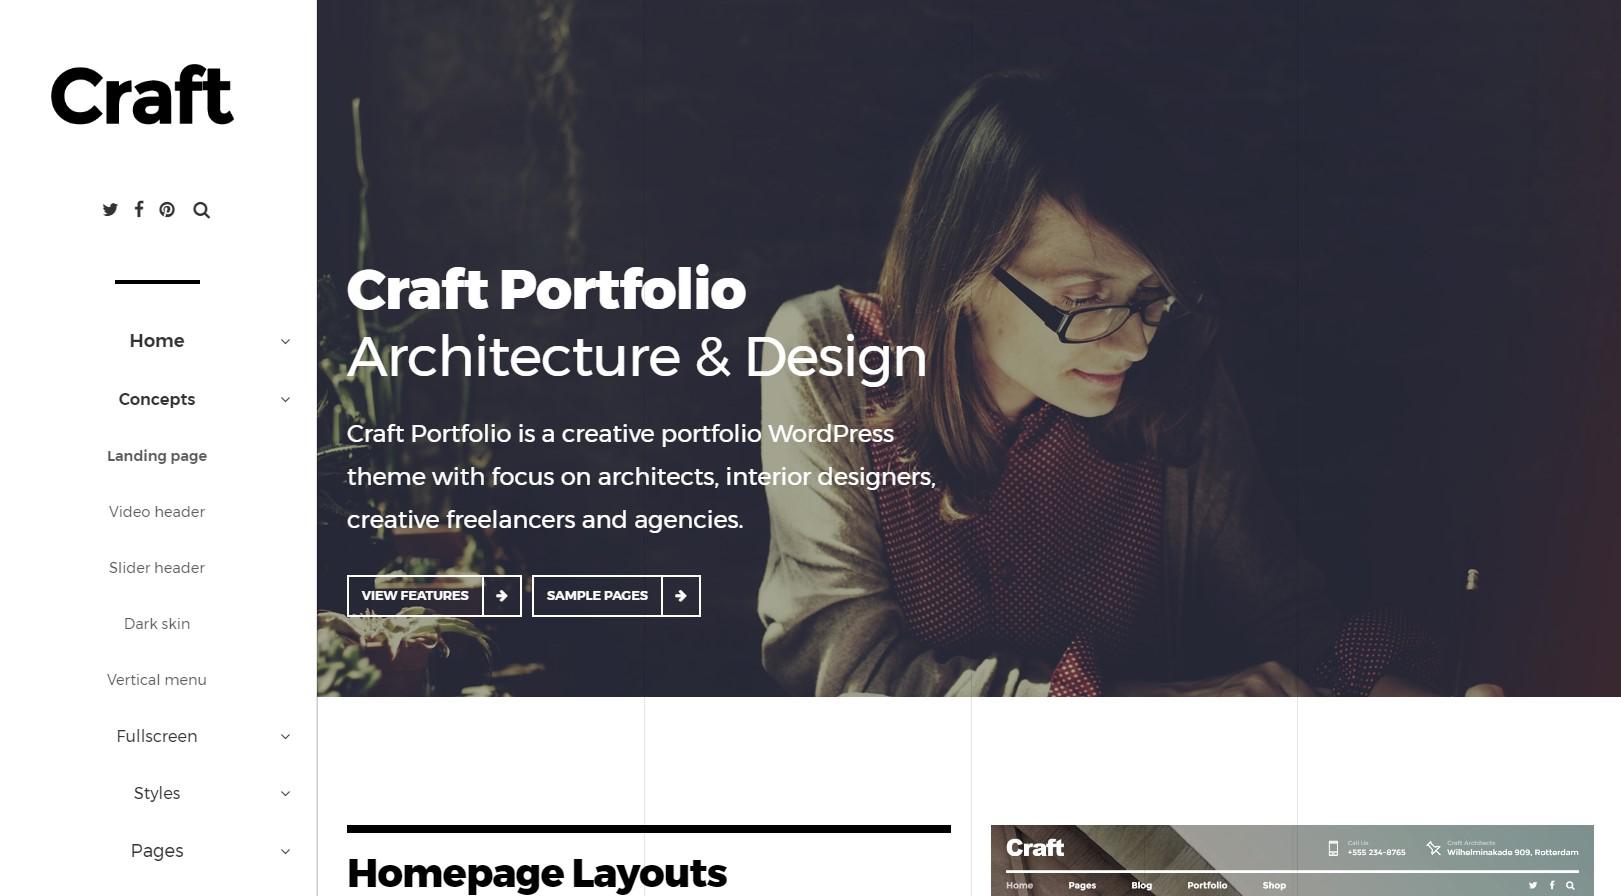 https://documentation.bold-themes.com/craft-portfolio/wp-content/uploads/sites/24/2017/09/menu-vertical-left.jpg